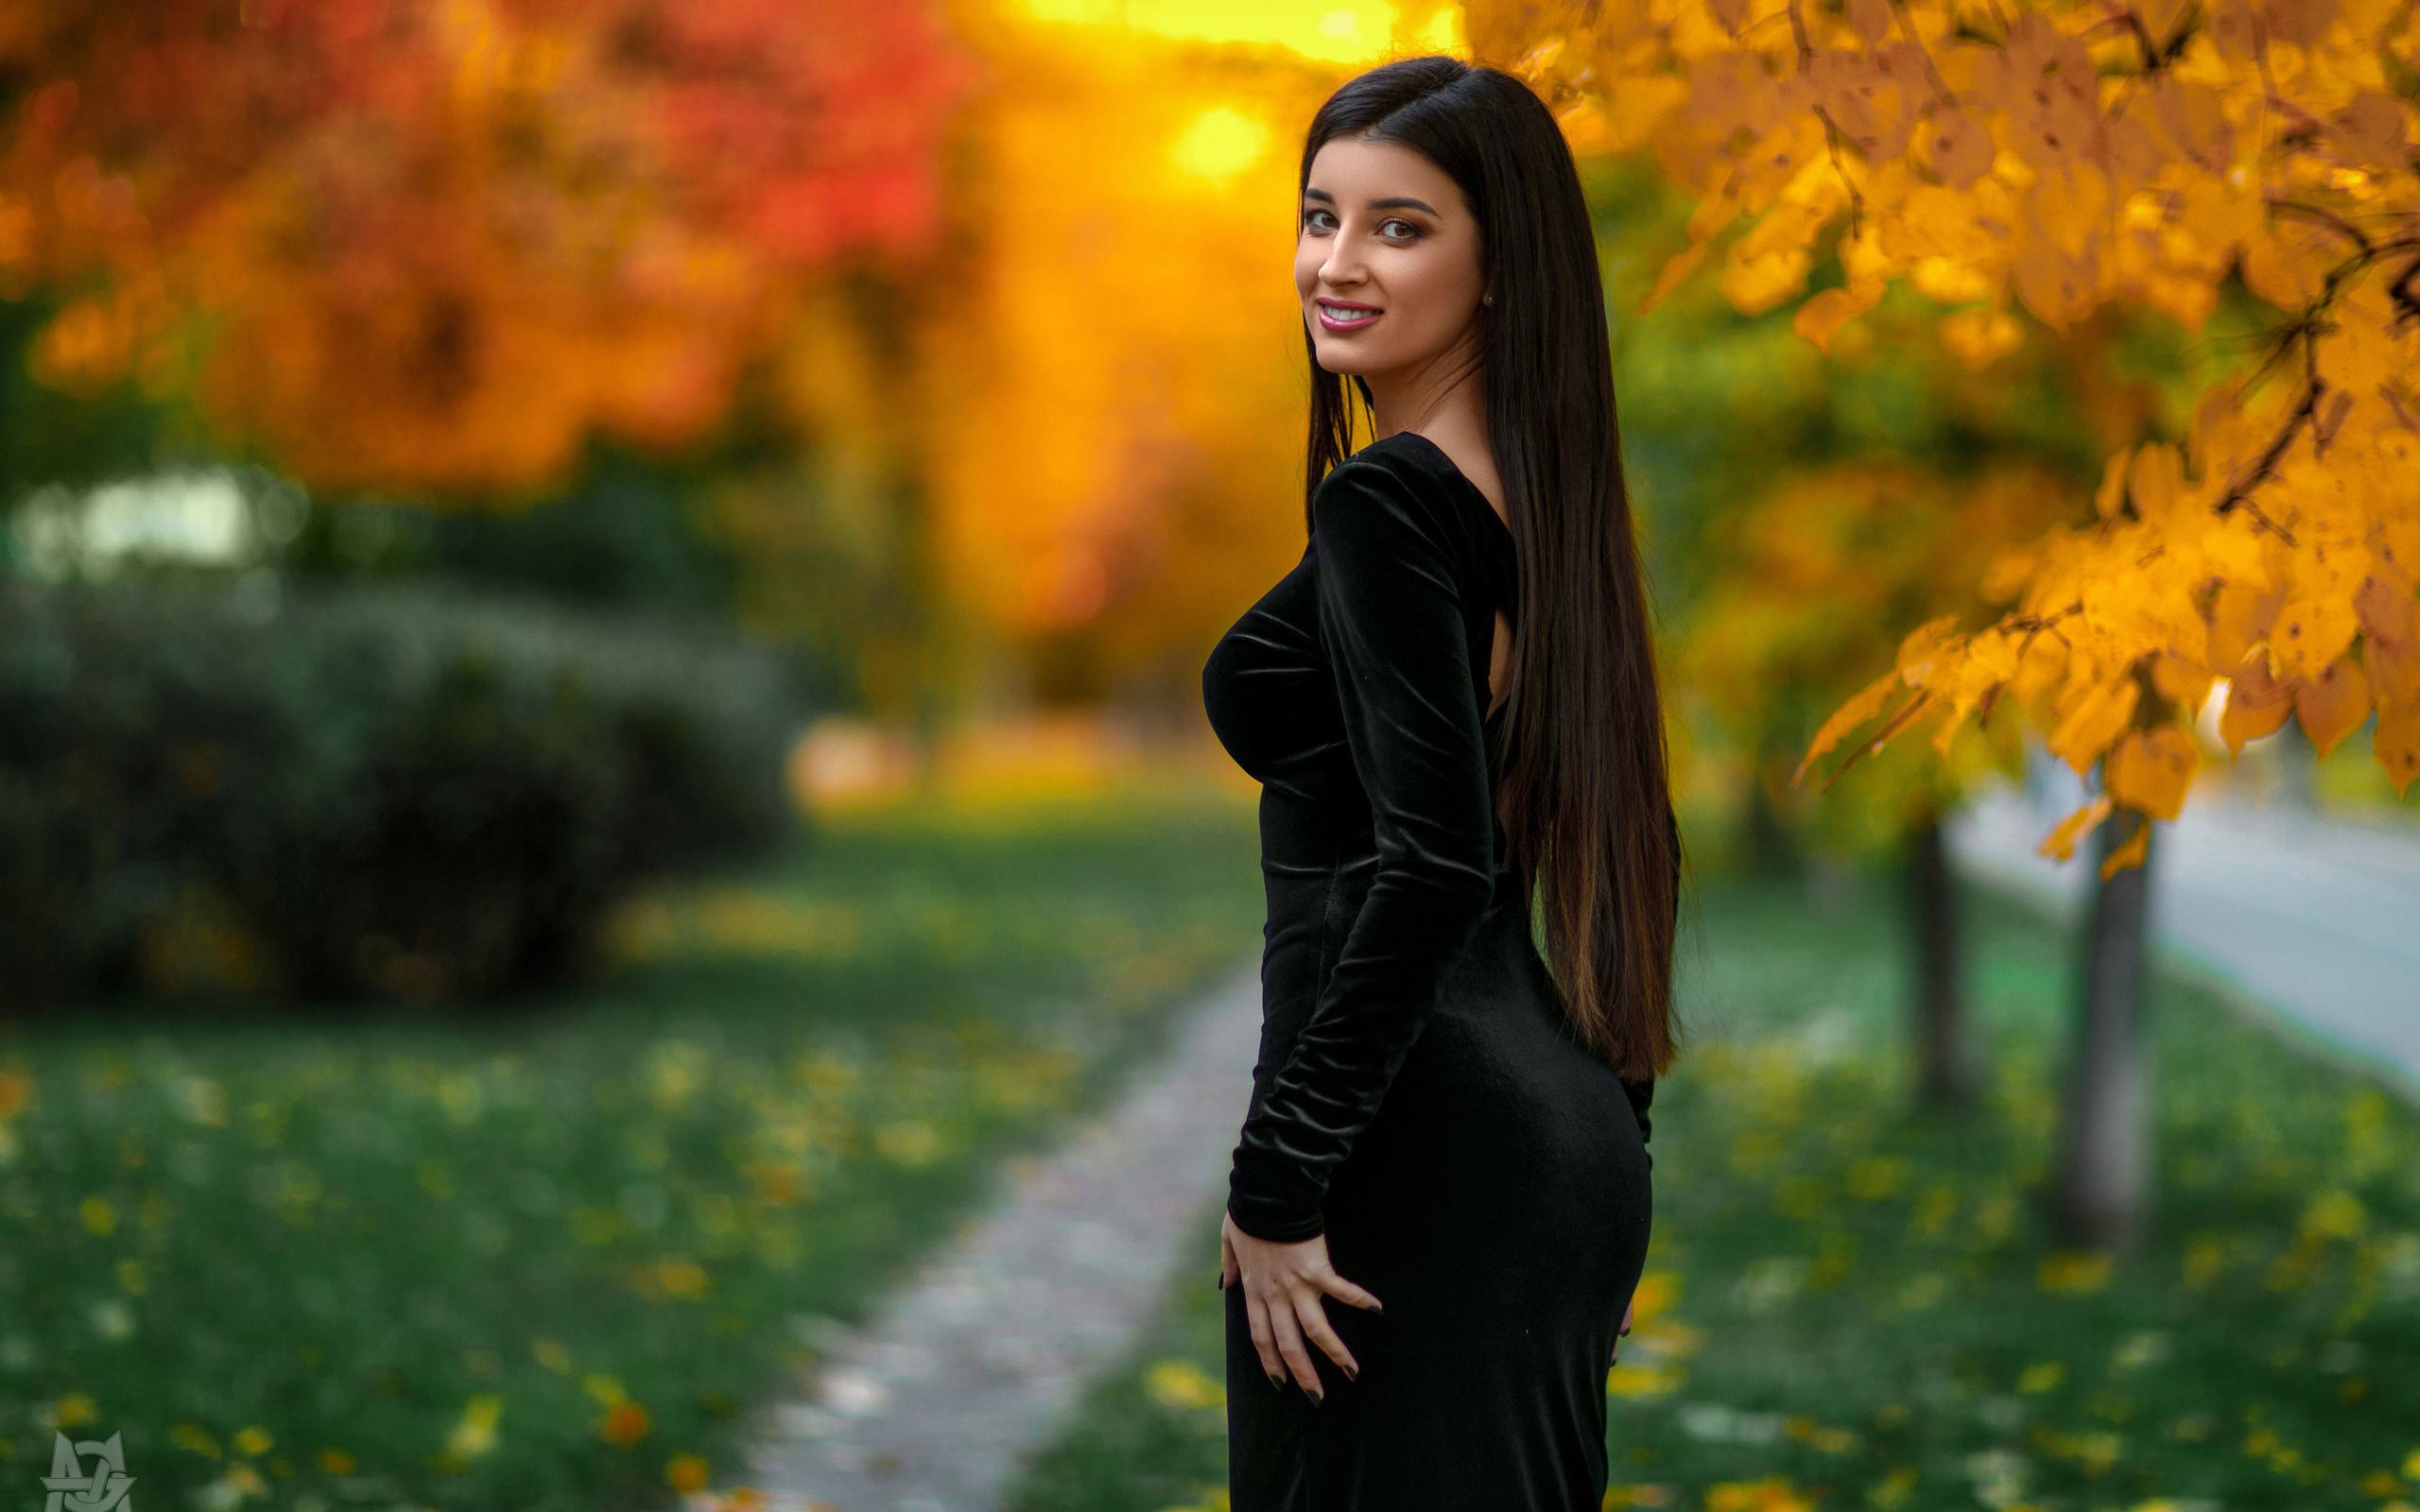 women, mihail gerasimov, tight dress, portrait, smiling, trees, leaves, grass, women outdoors, dress, long hair, painted nails, depth of field